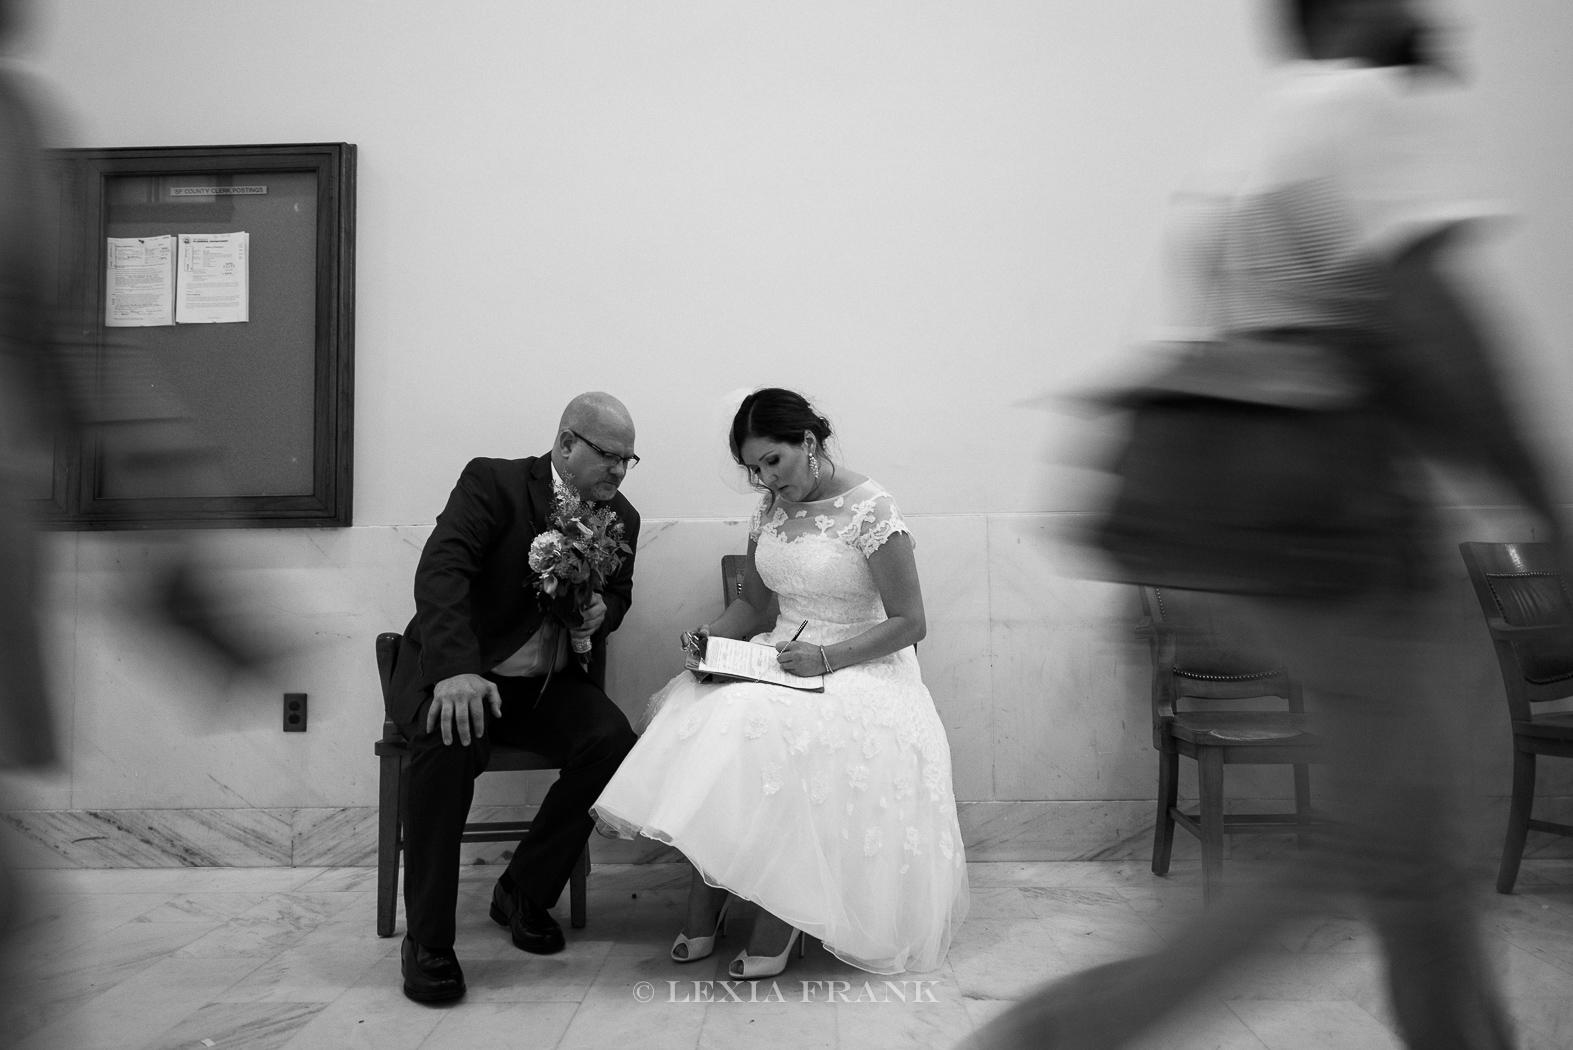 Destination wedding photographer Lexia Frank- a portland oregon fine art film photographer - photographs a San Francisco City Hall wedding in san francisco in film www.lexiafrank.com